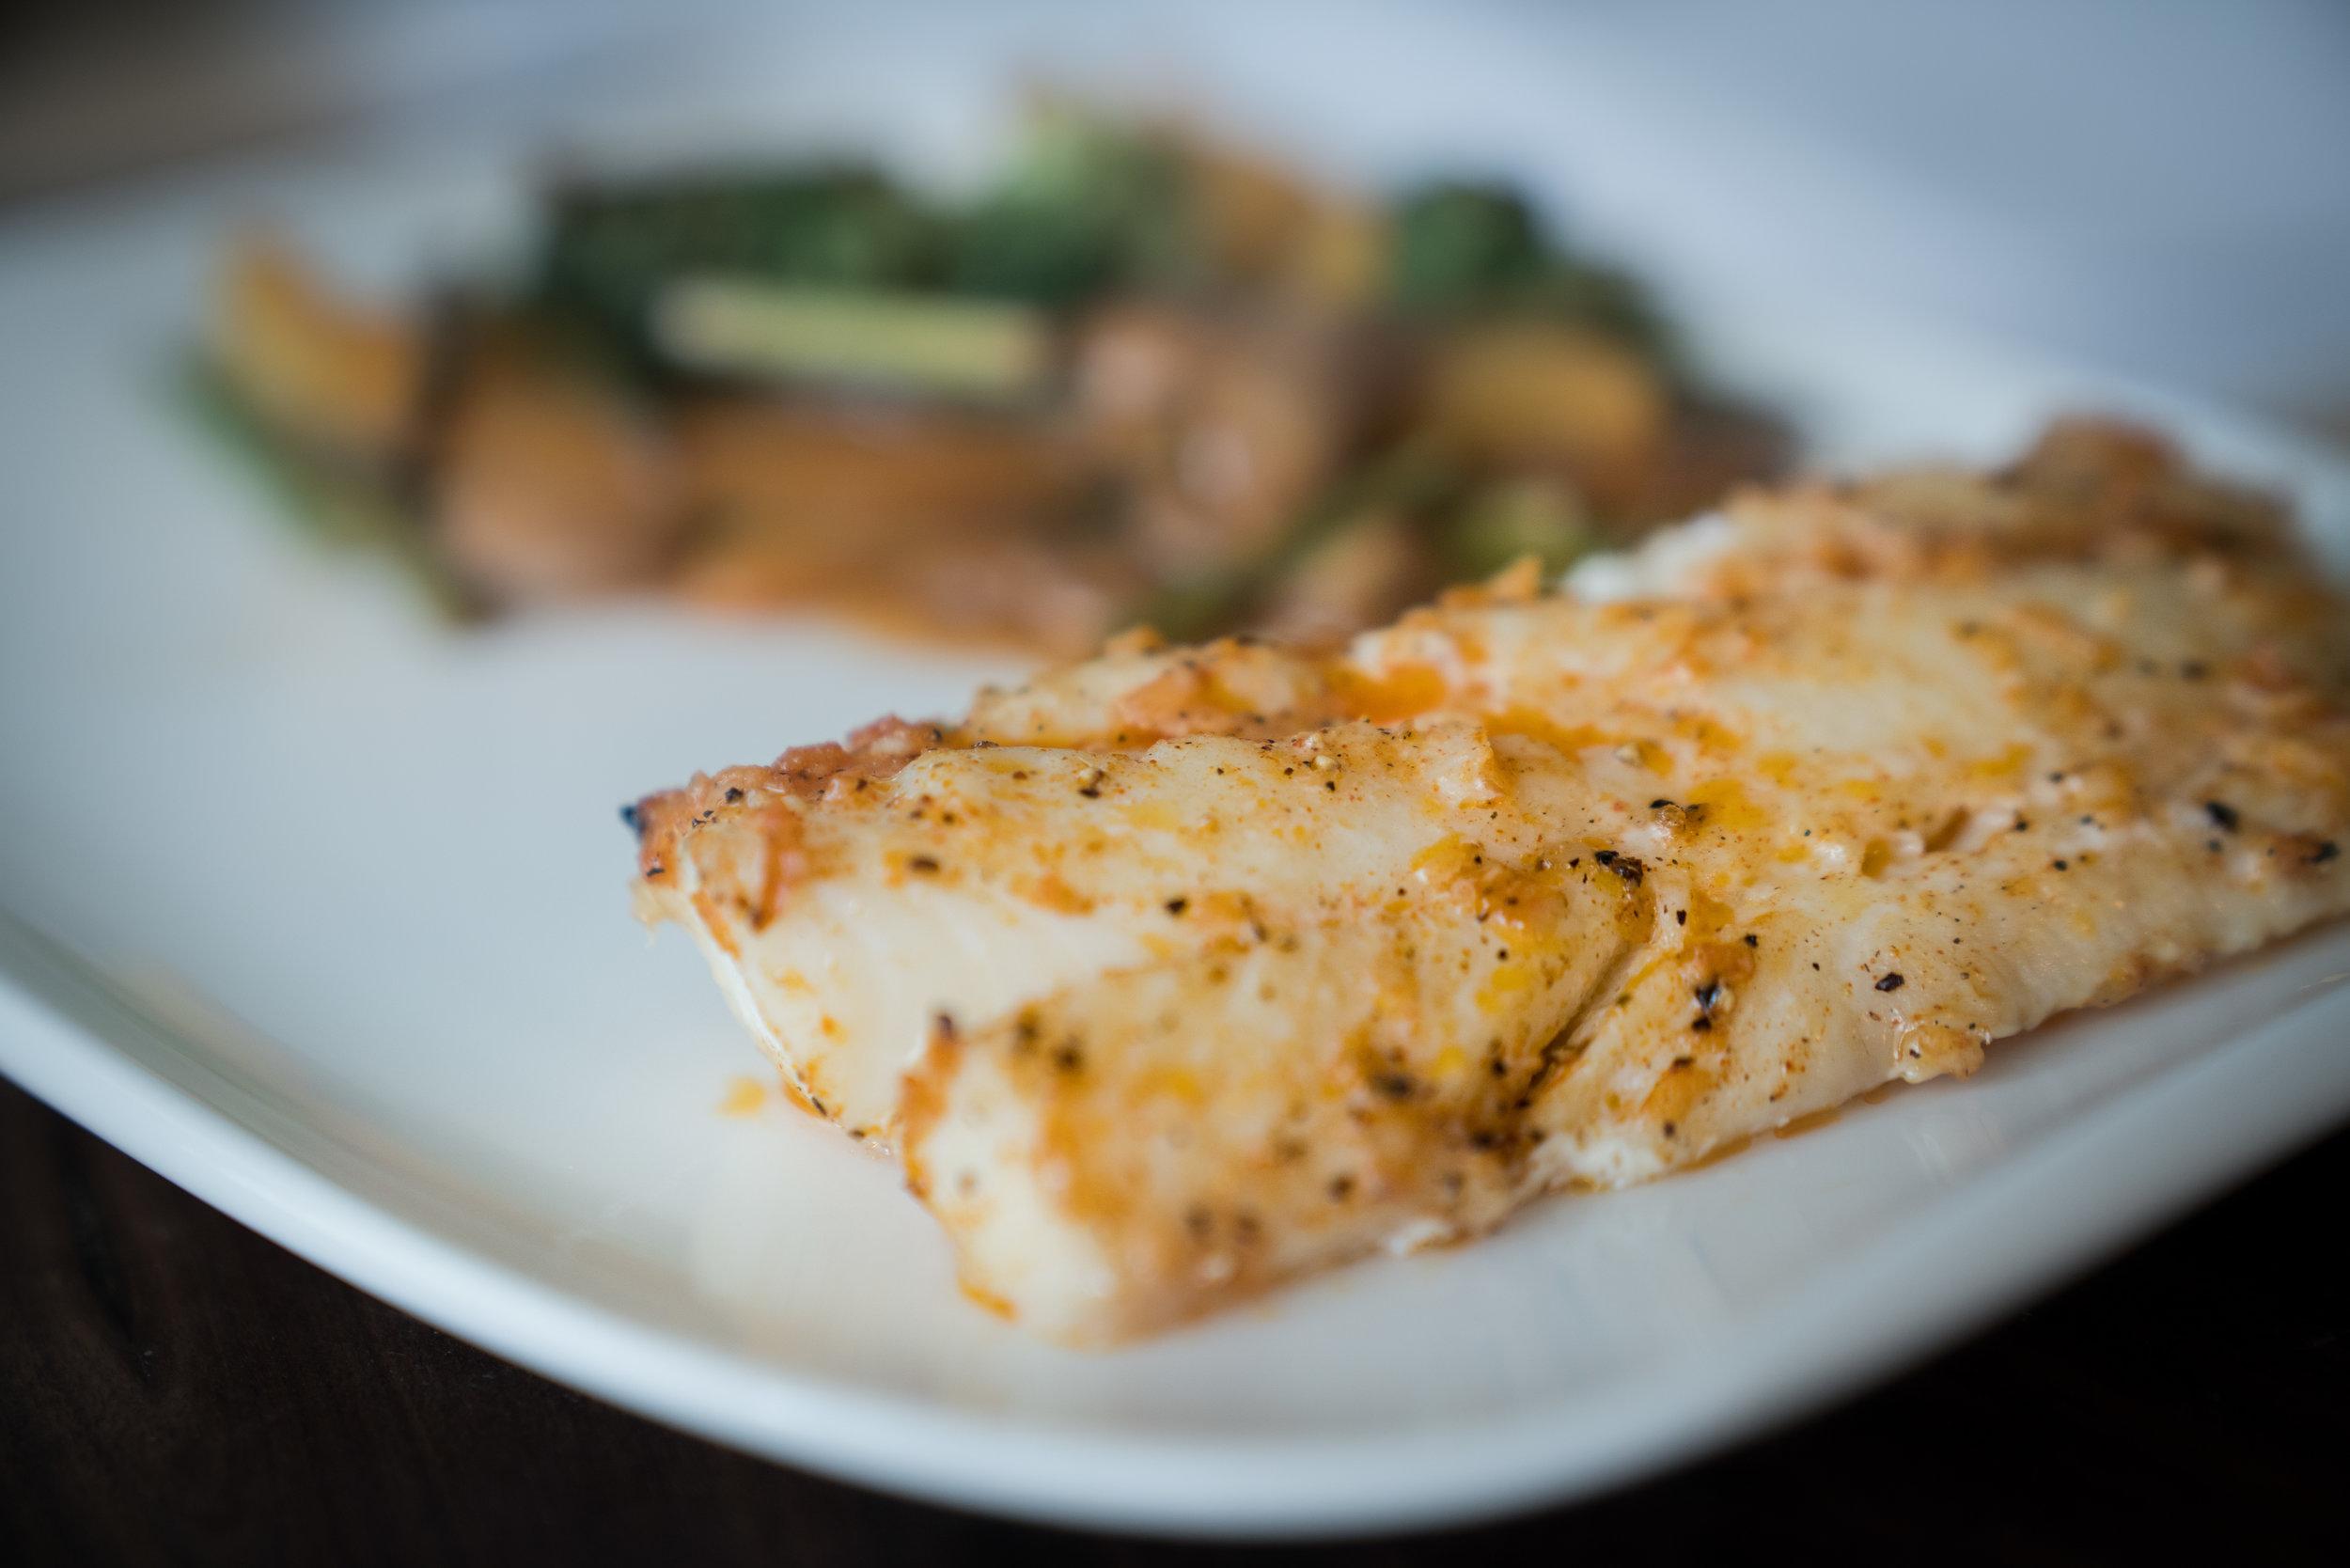 Baked Haddock Recipe via micahdeyoung.com